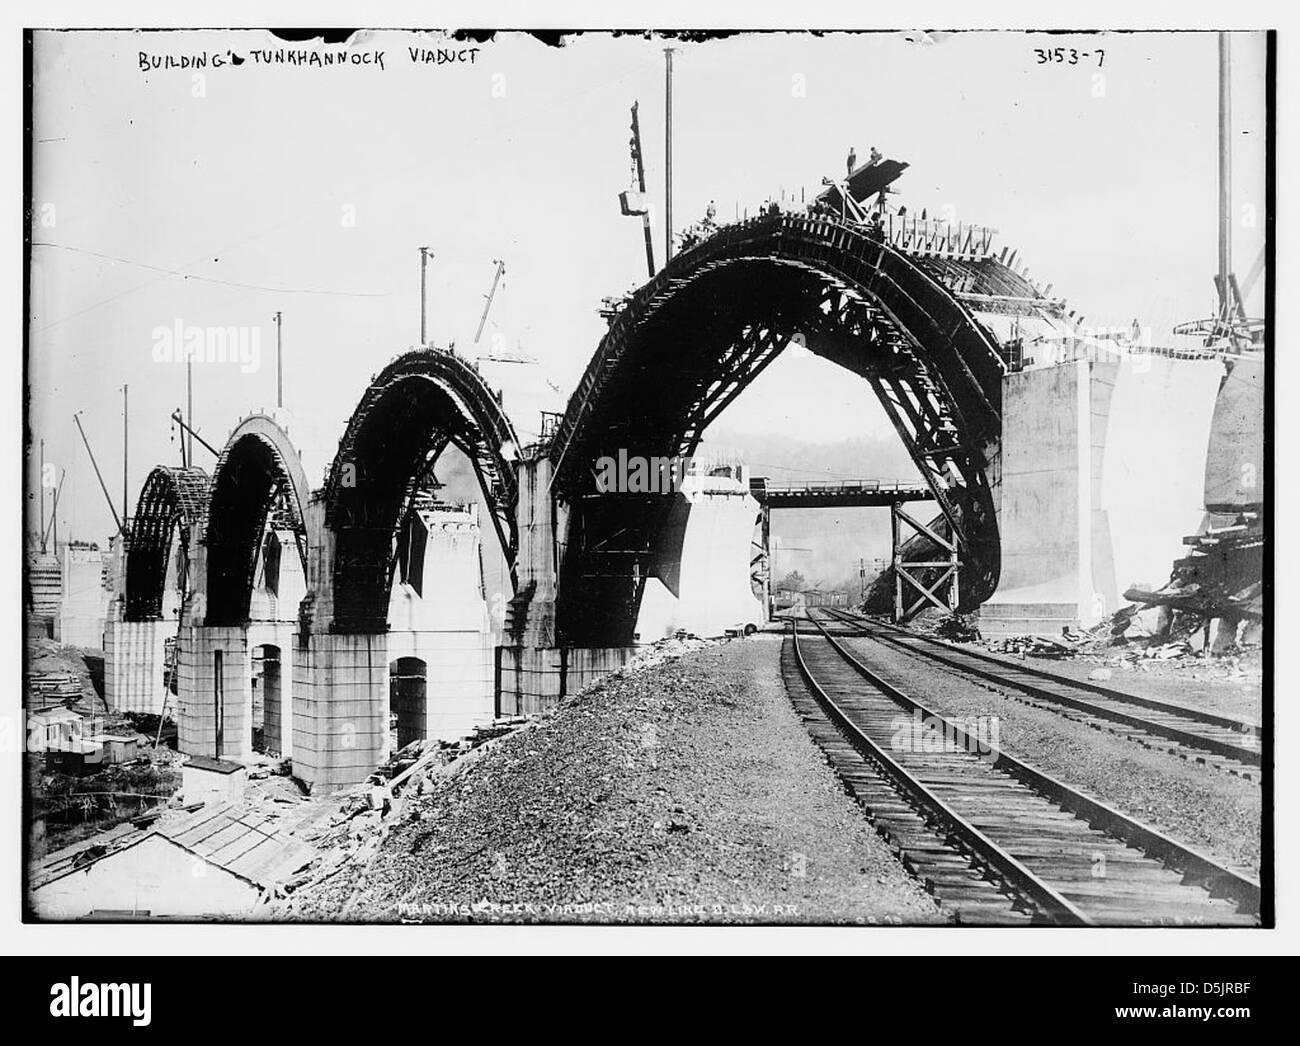 Bldg.[i.e., Building] Tunkhannock Viaduct [Martin's Creek Viaduct] (LOC) - Stock Image